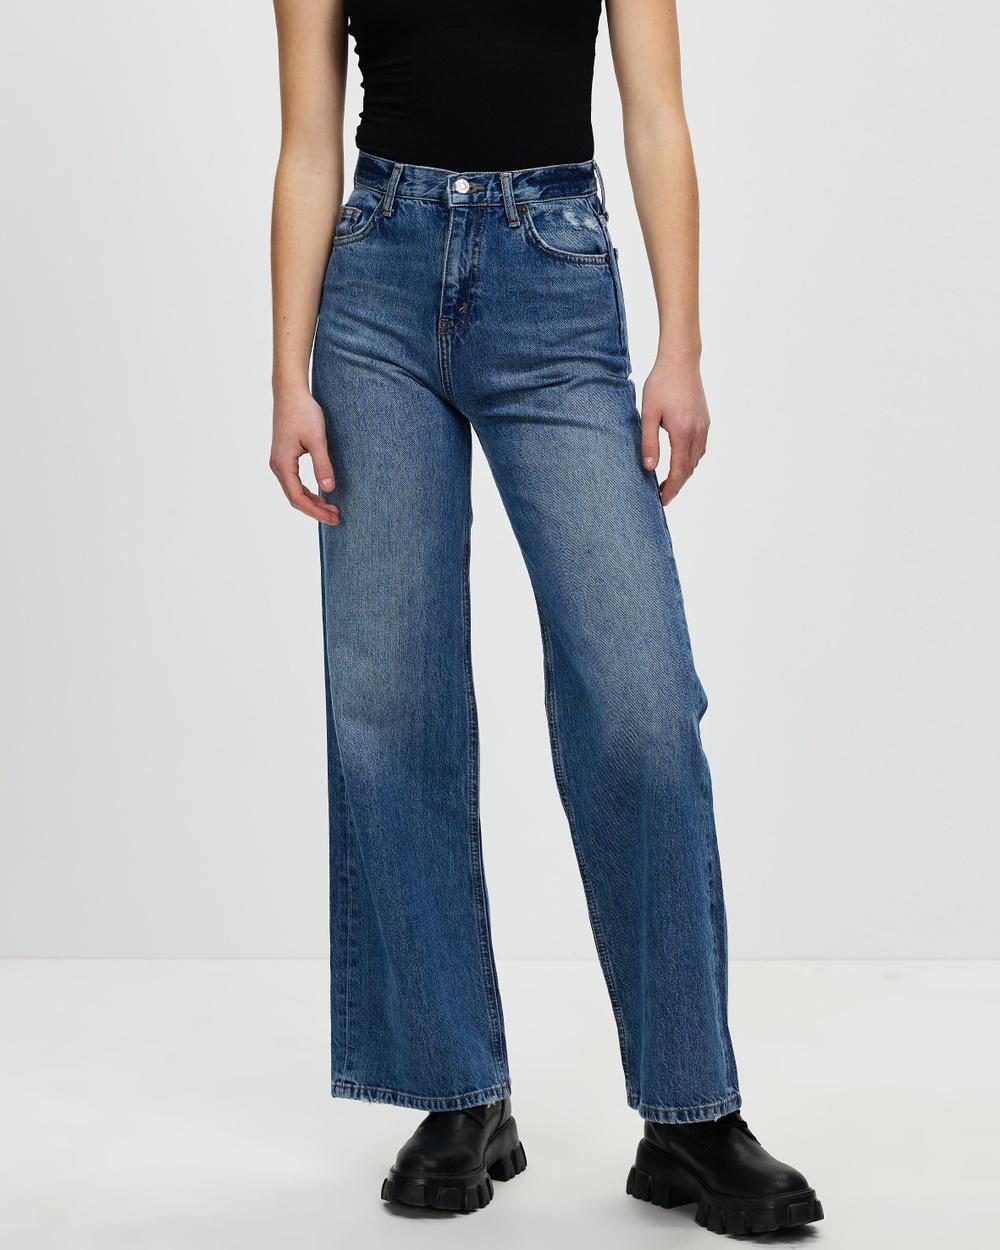 TOPSHOP High Waisted Wide Leg Jeans High-Waisted Mid Denim Australia